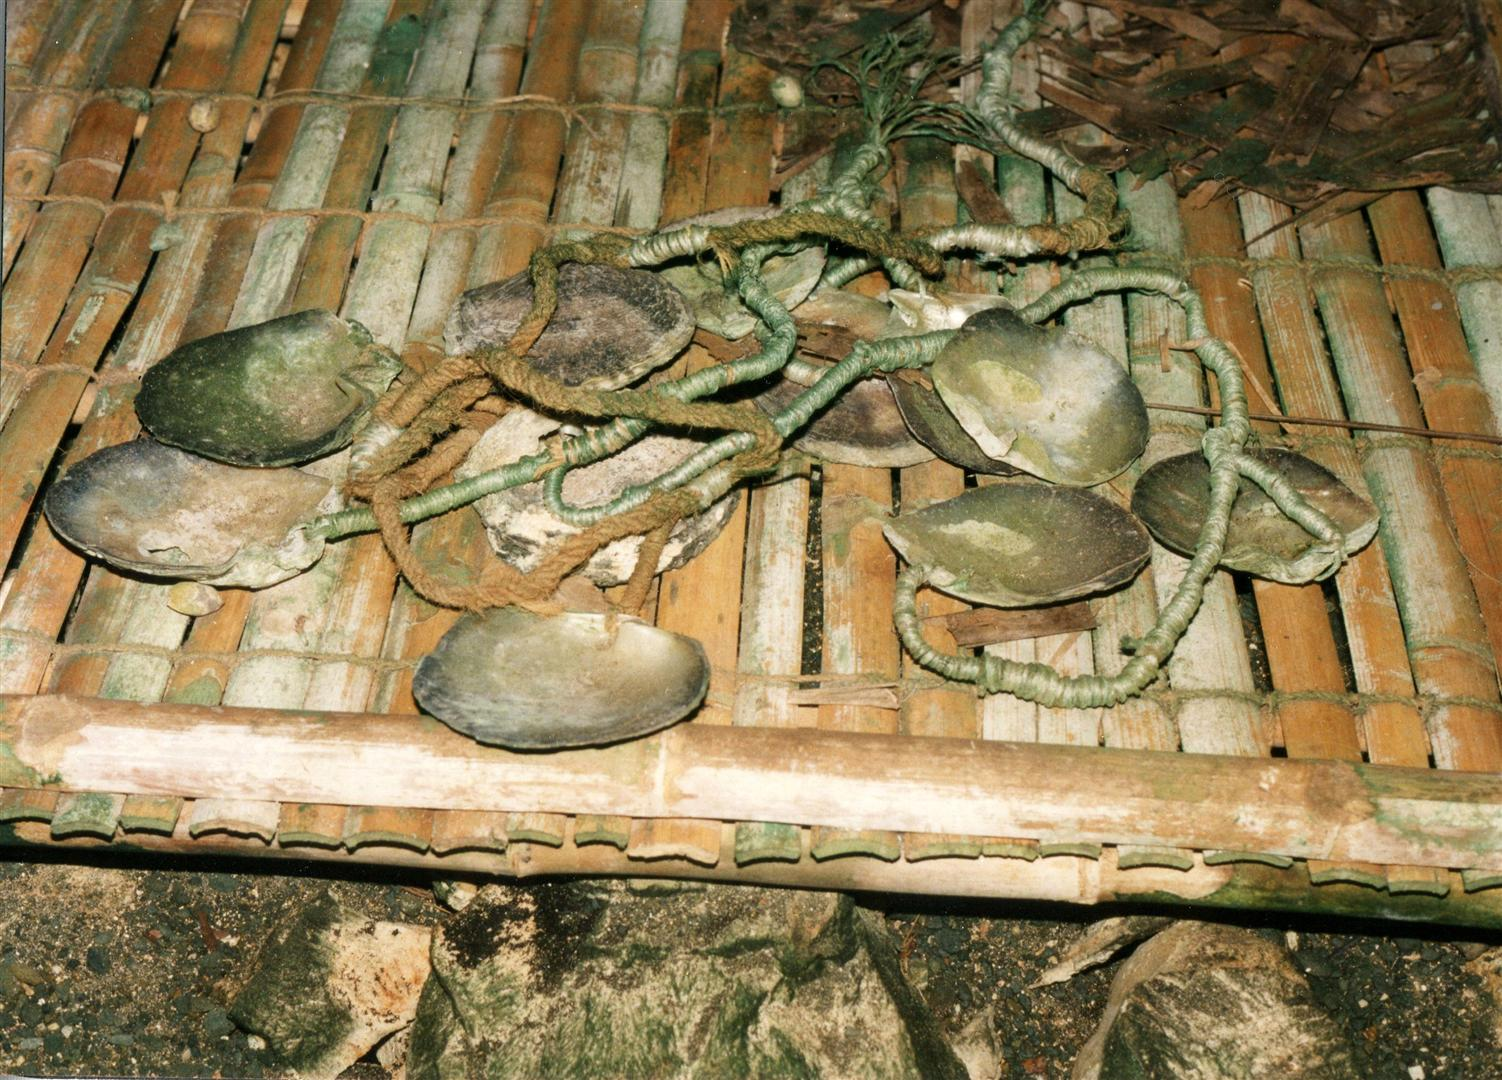 yar-Geld-aus-Perlmuttmuschelschalen (Copyright T.Lautz)